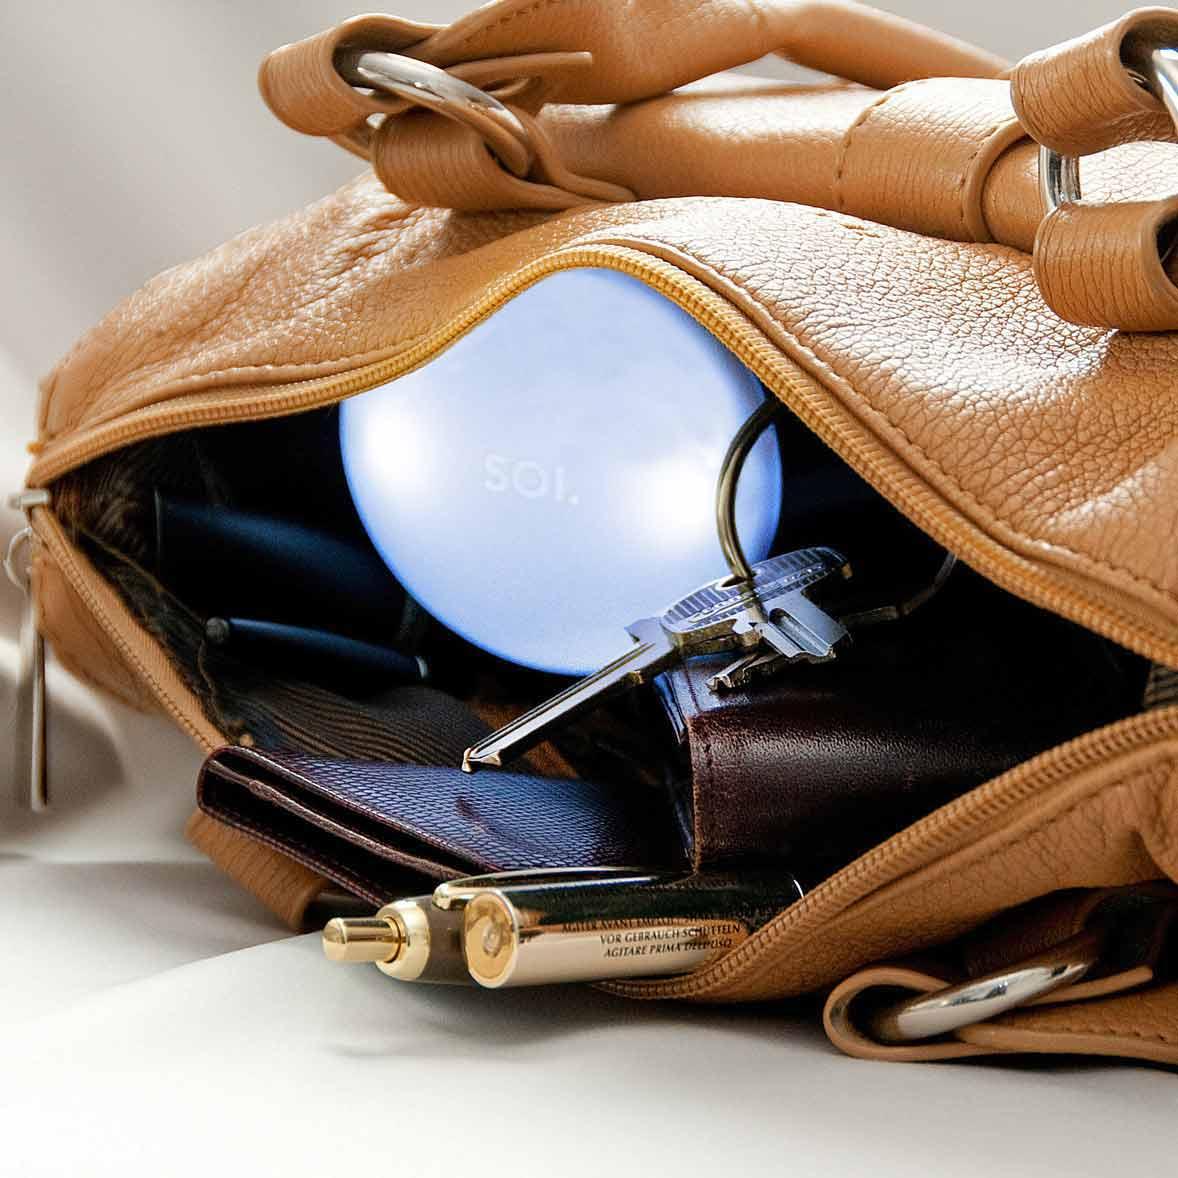 Automatic handbag light SOI | The Design Gift Shop